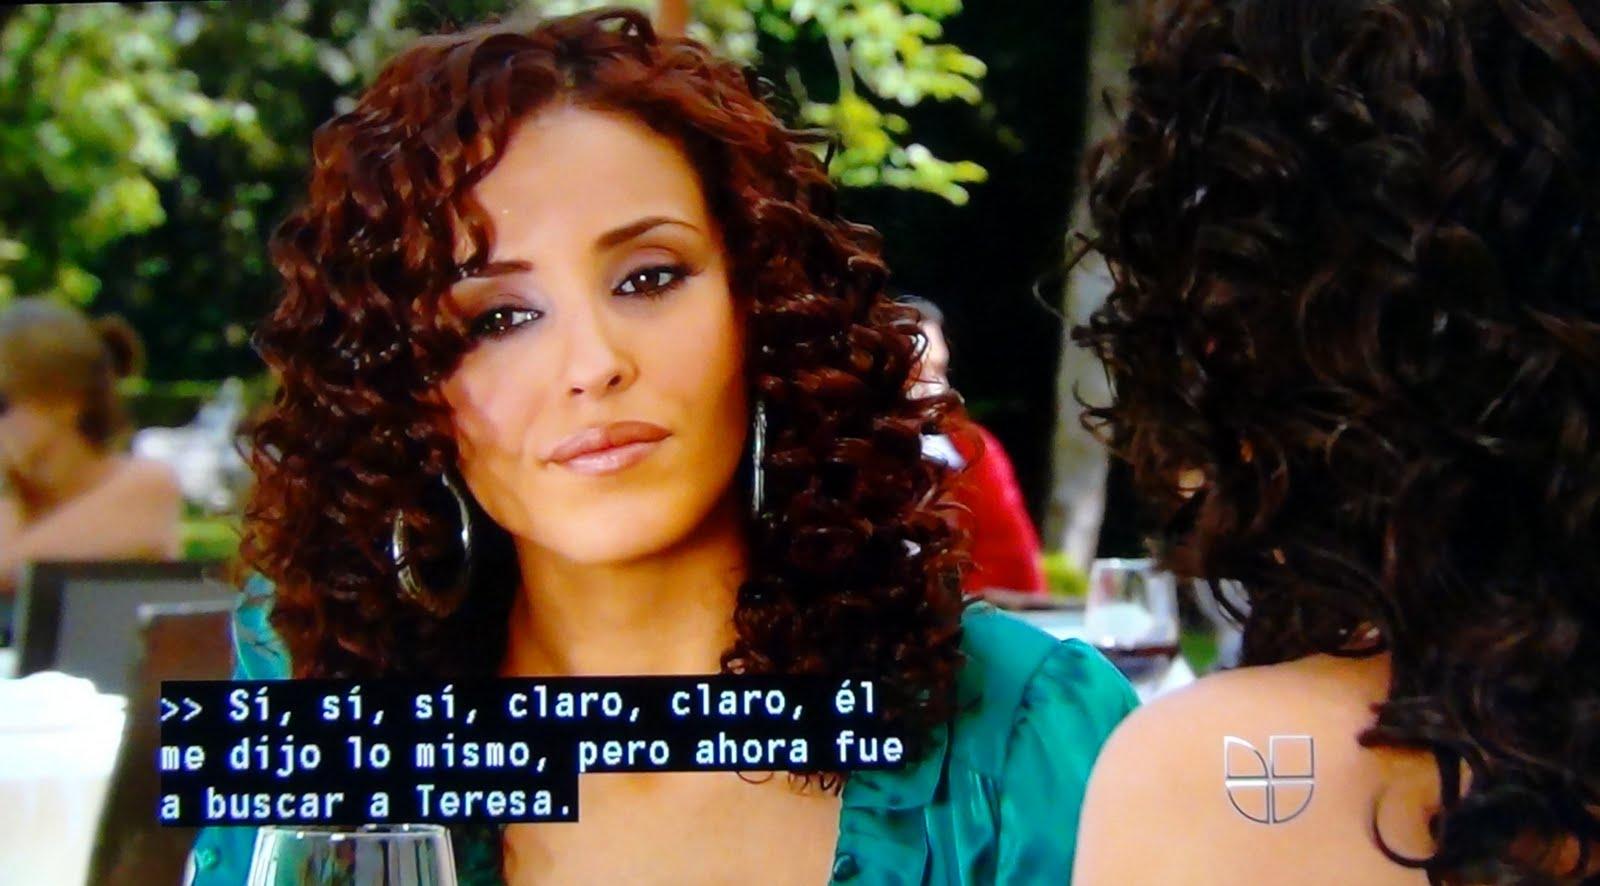 Caray, Caray!: Teresa Wed 9/7/11 #133 Mariano Finally Gets